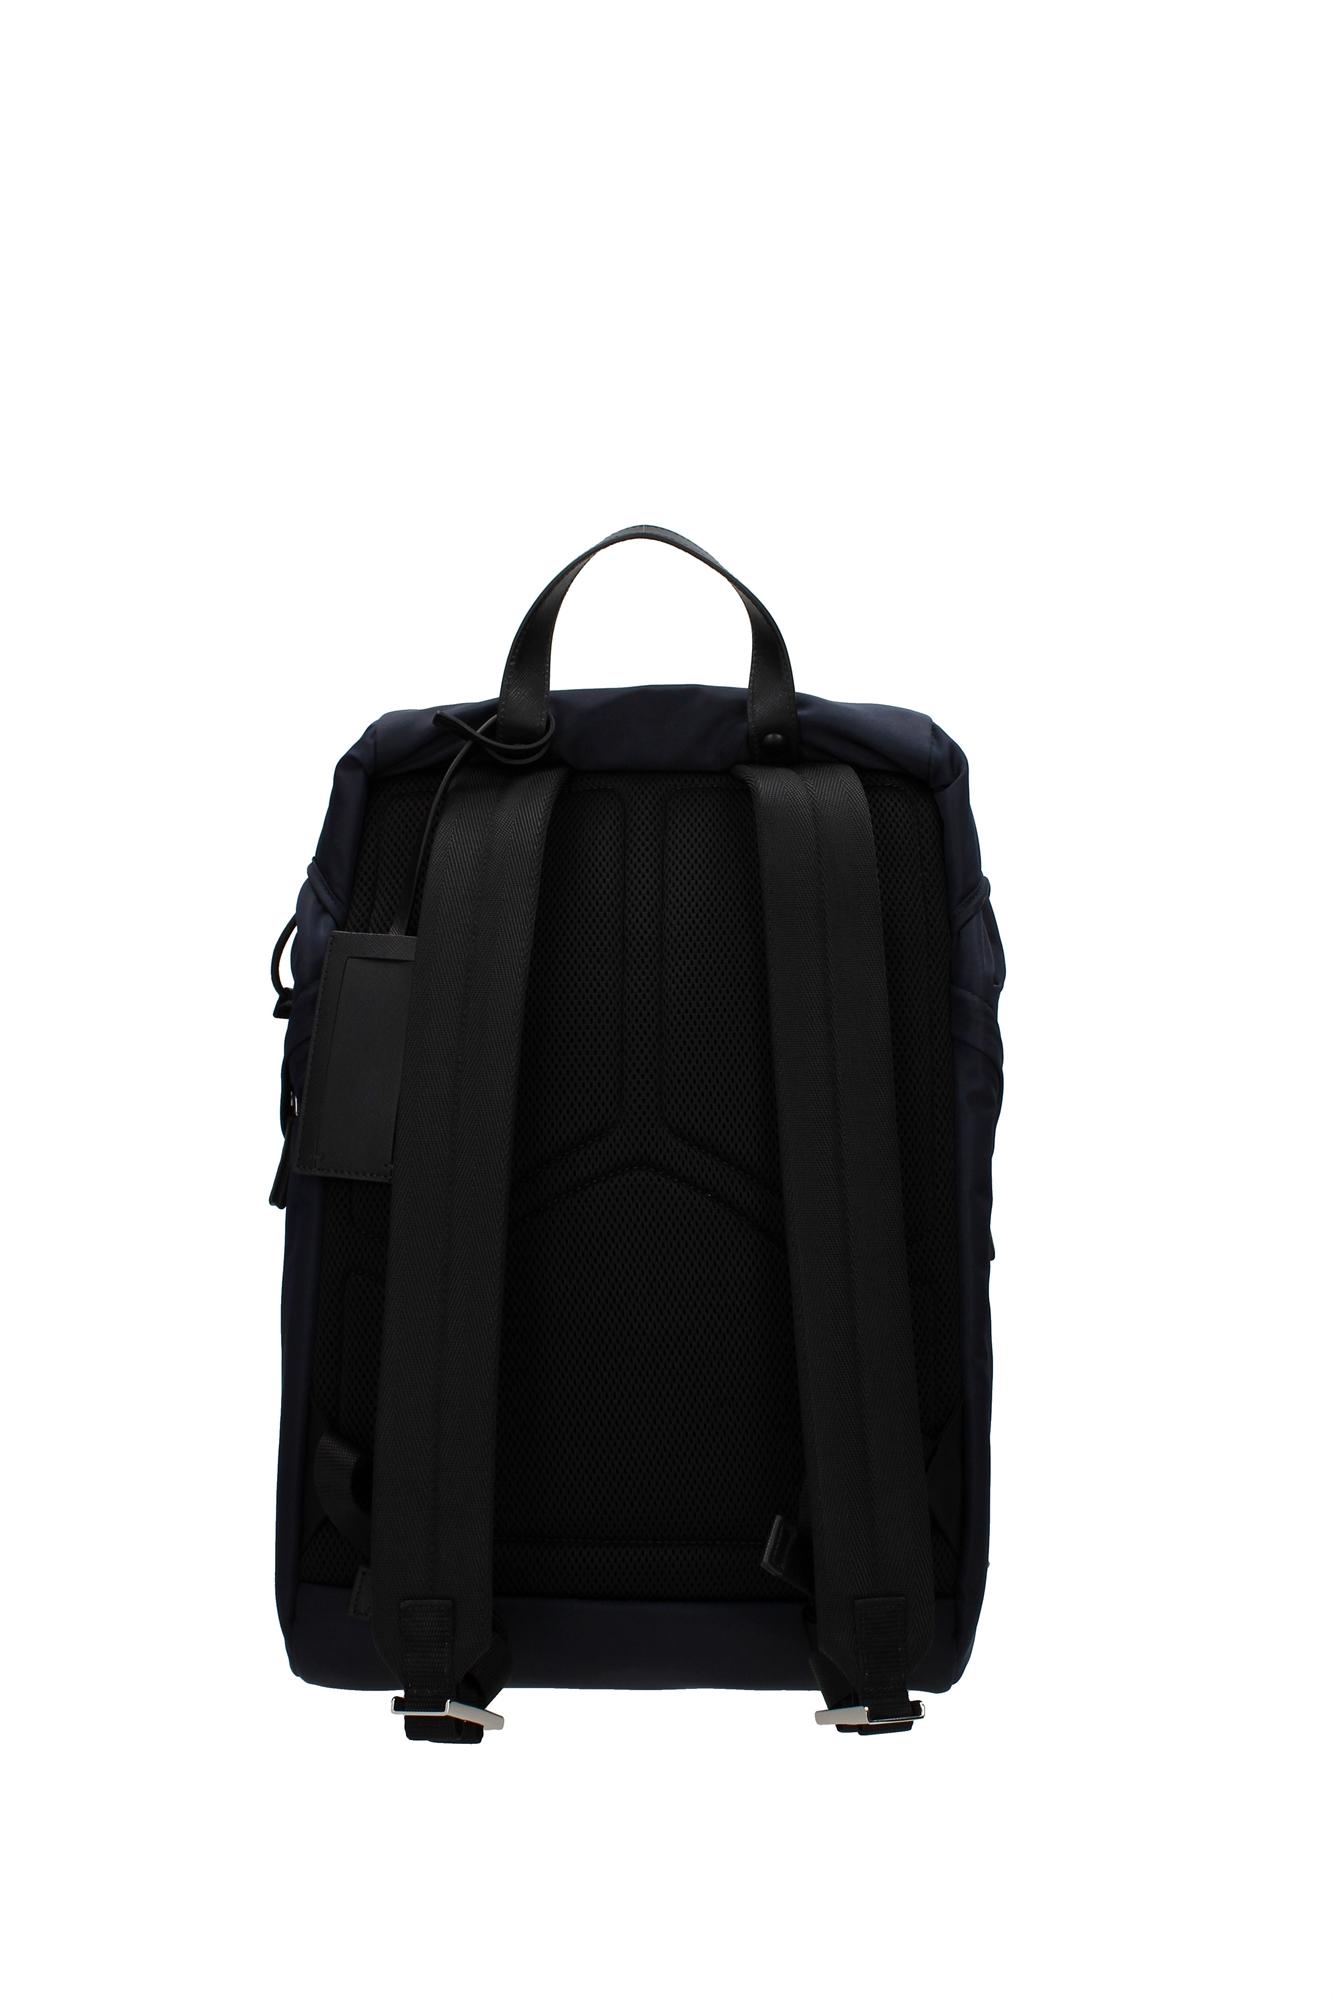 tasche rucksack prada herren nylon blau 2vz135bleu ebay. Black Bedroom Furniture Sets. Home Design Ideas